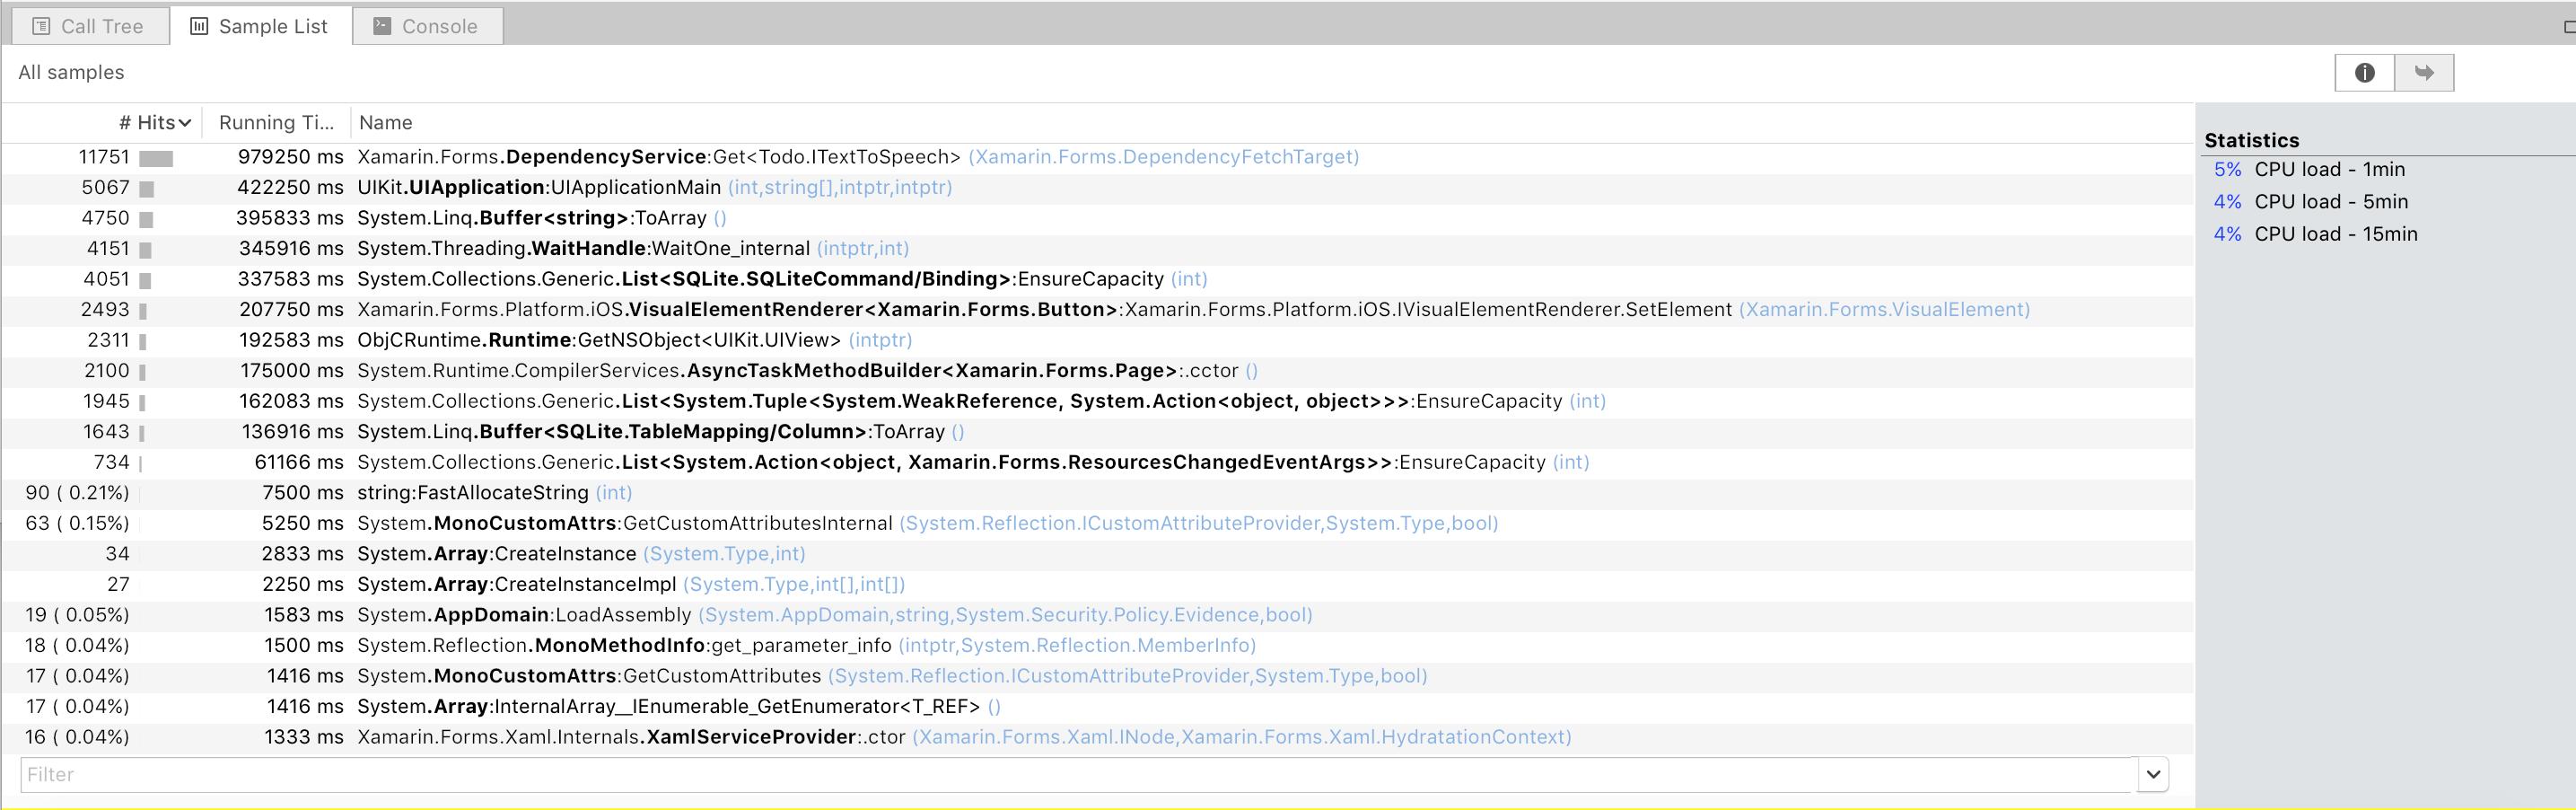 Xamarin Profiler - Xamarin | Microsoft Docs